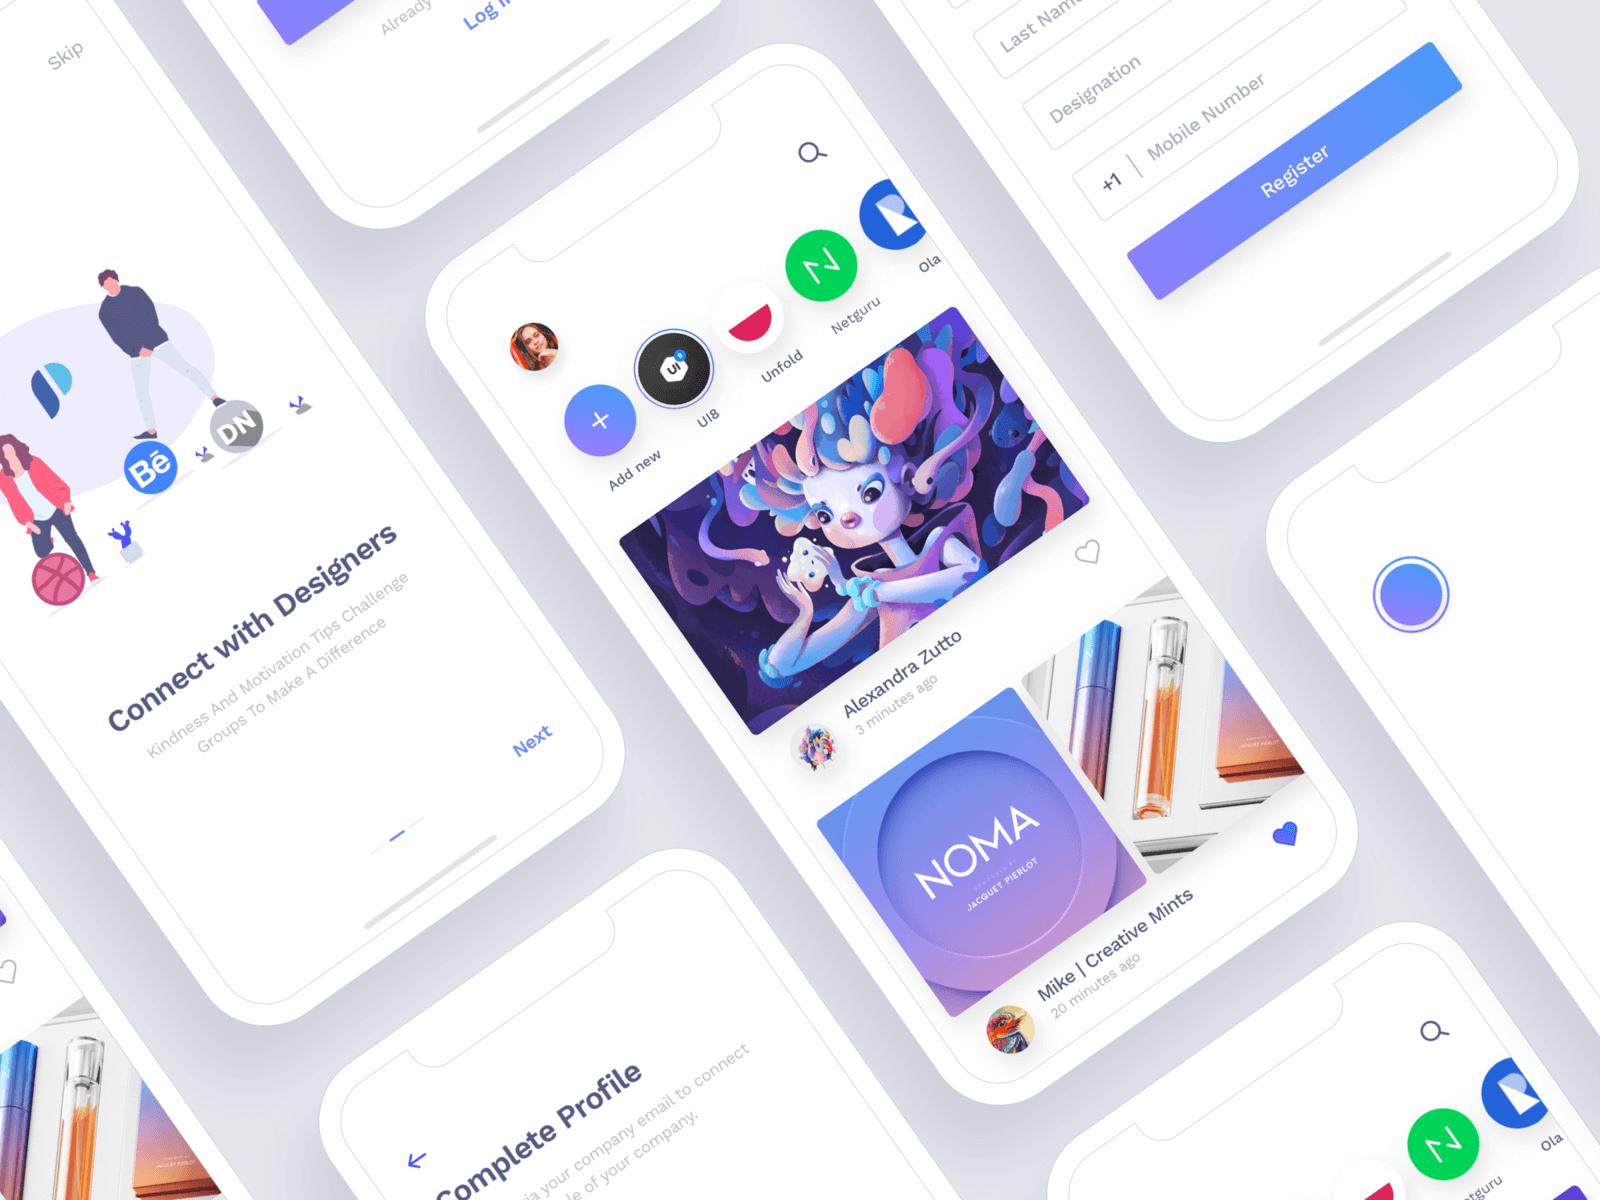 Free UI Kits, Fonts, Icons and more - UIBundle